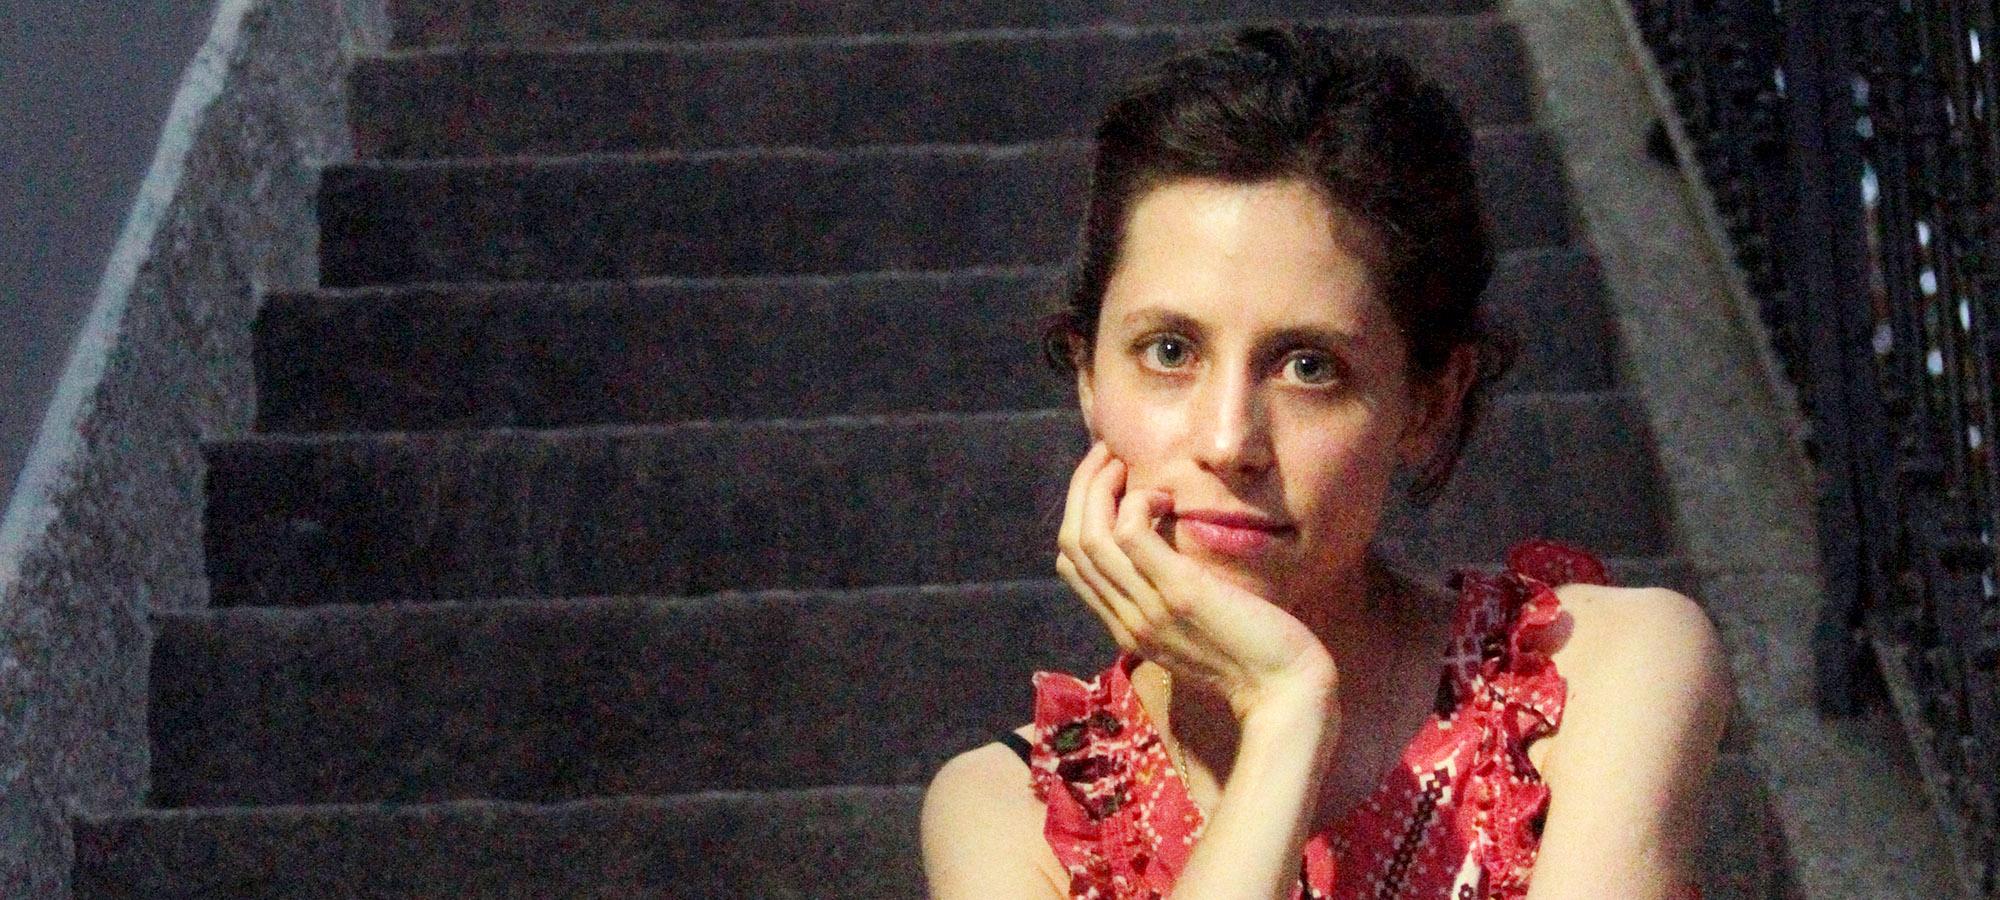 Inês Efron inaugura unidade carioca da Academia                                                          Internacional de Cinema